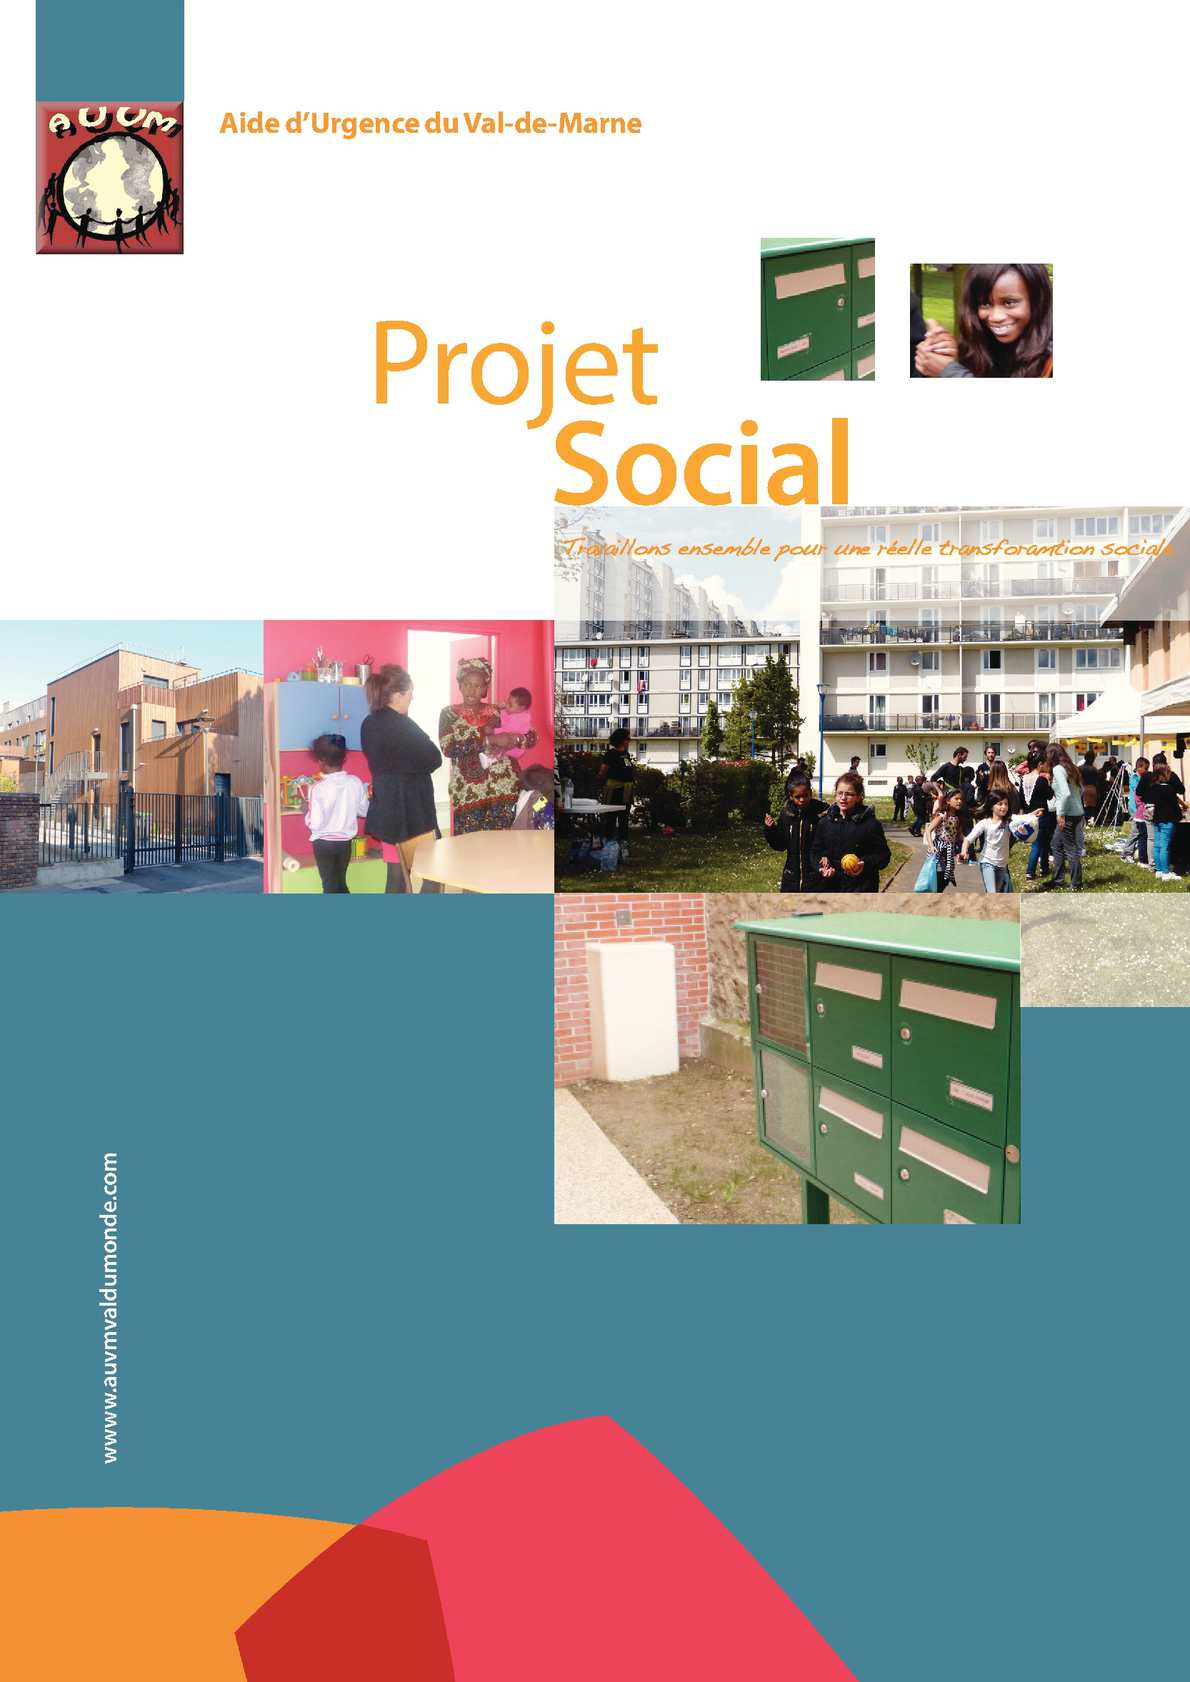 Notre projet social